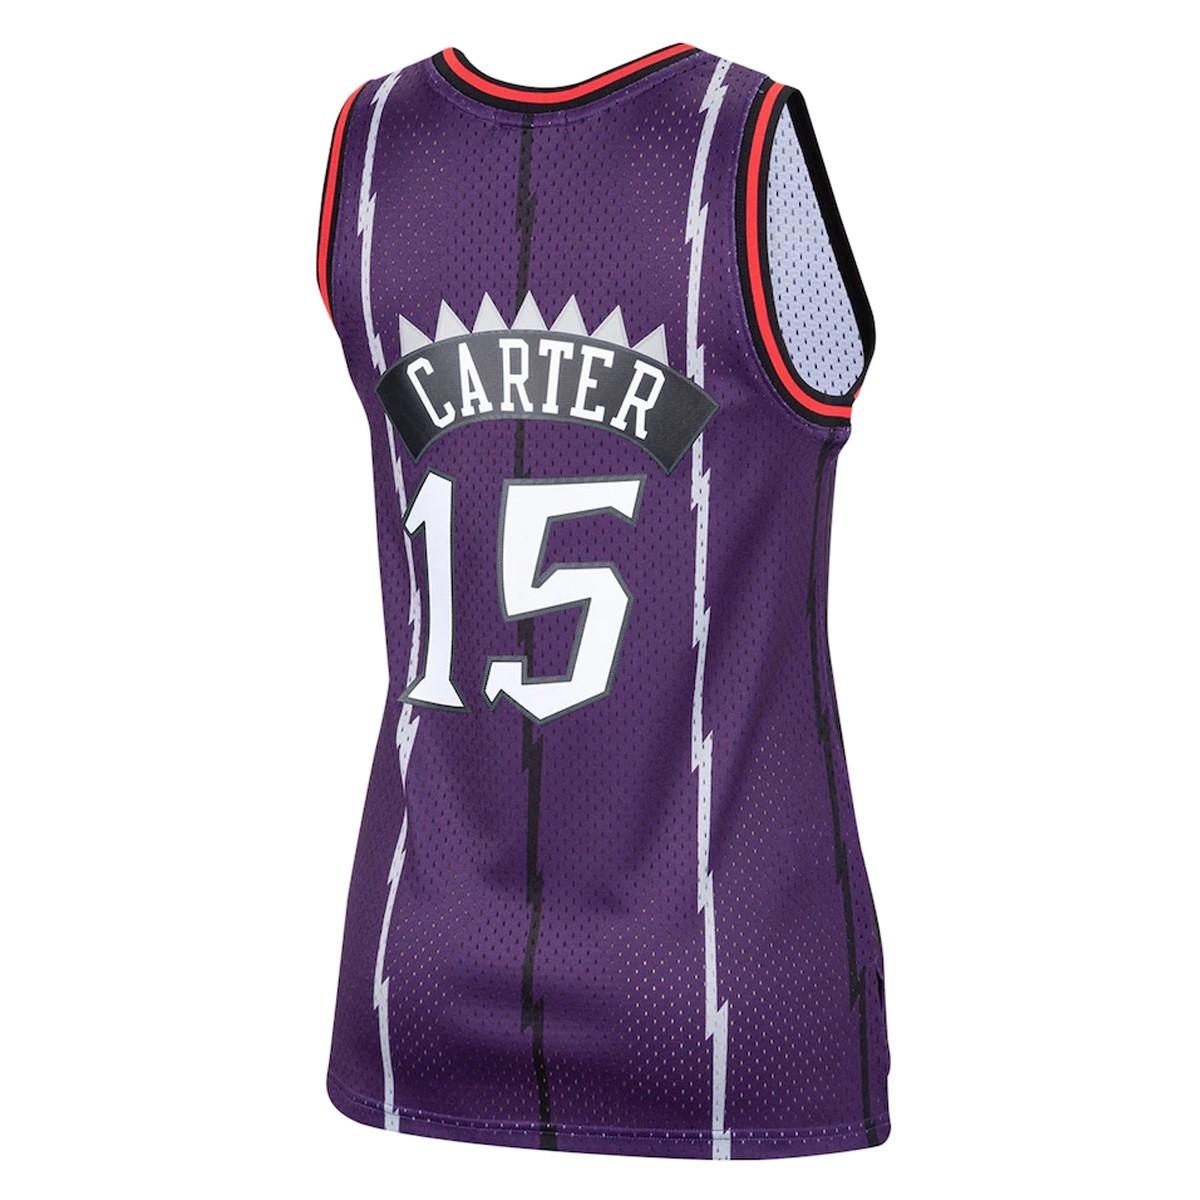 Mitchell & Ness Swingman Jersey Woman Toronto Raptors 'Vince Carter'-NNBJEL18120-TRA